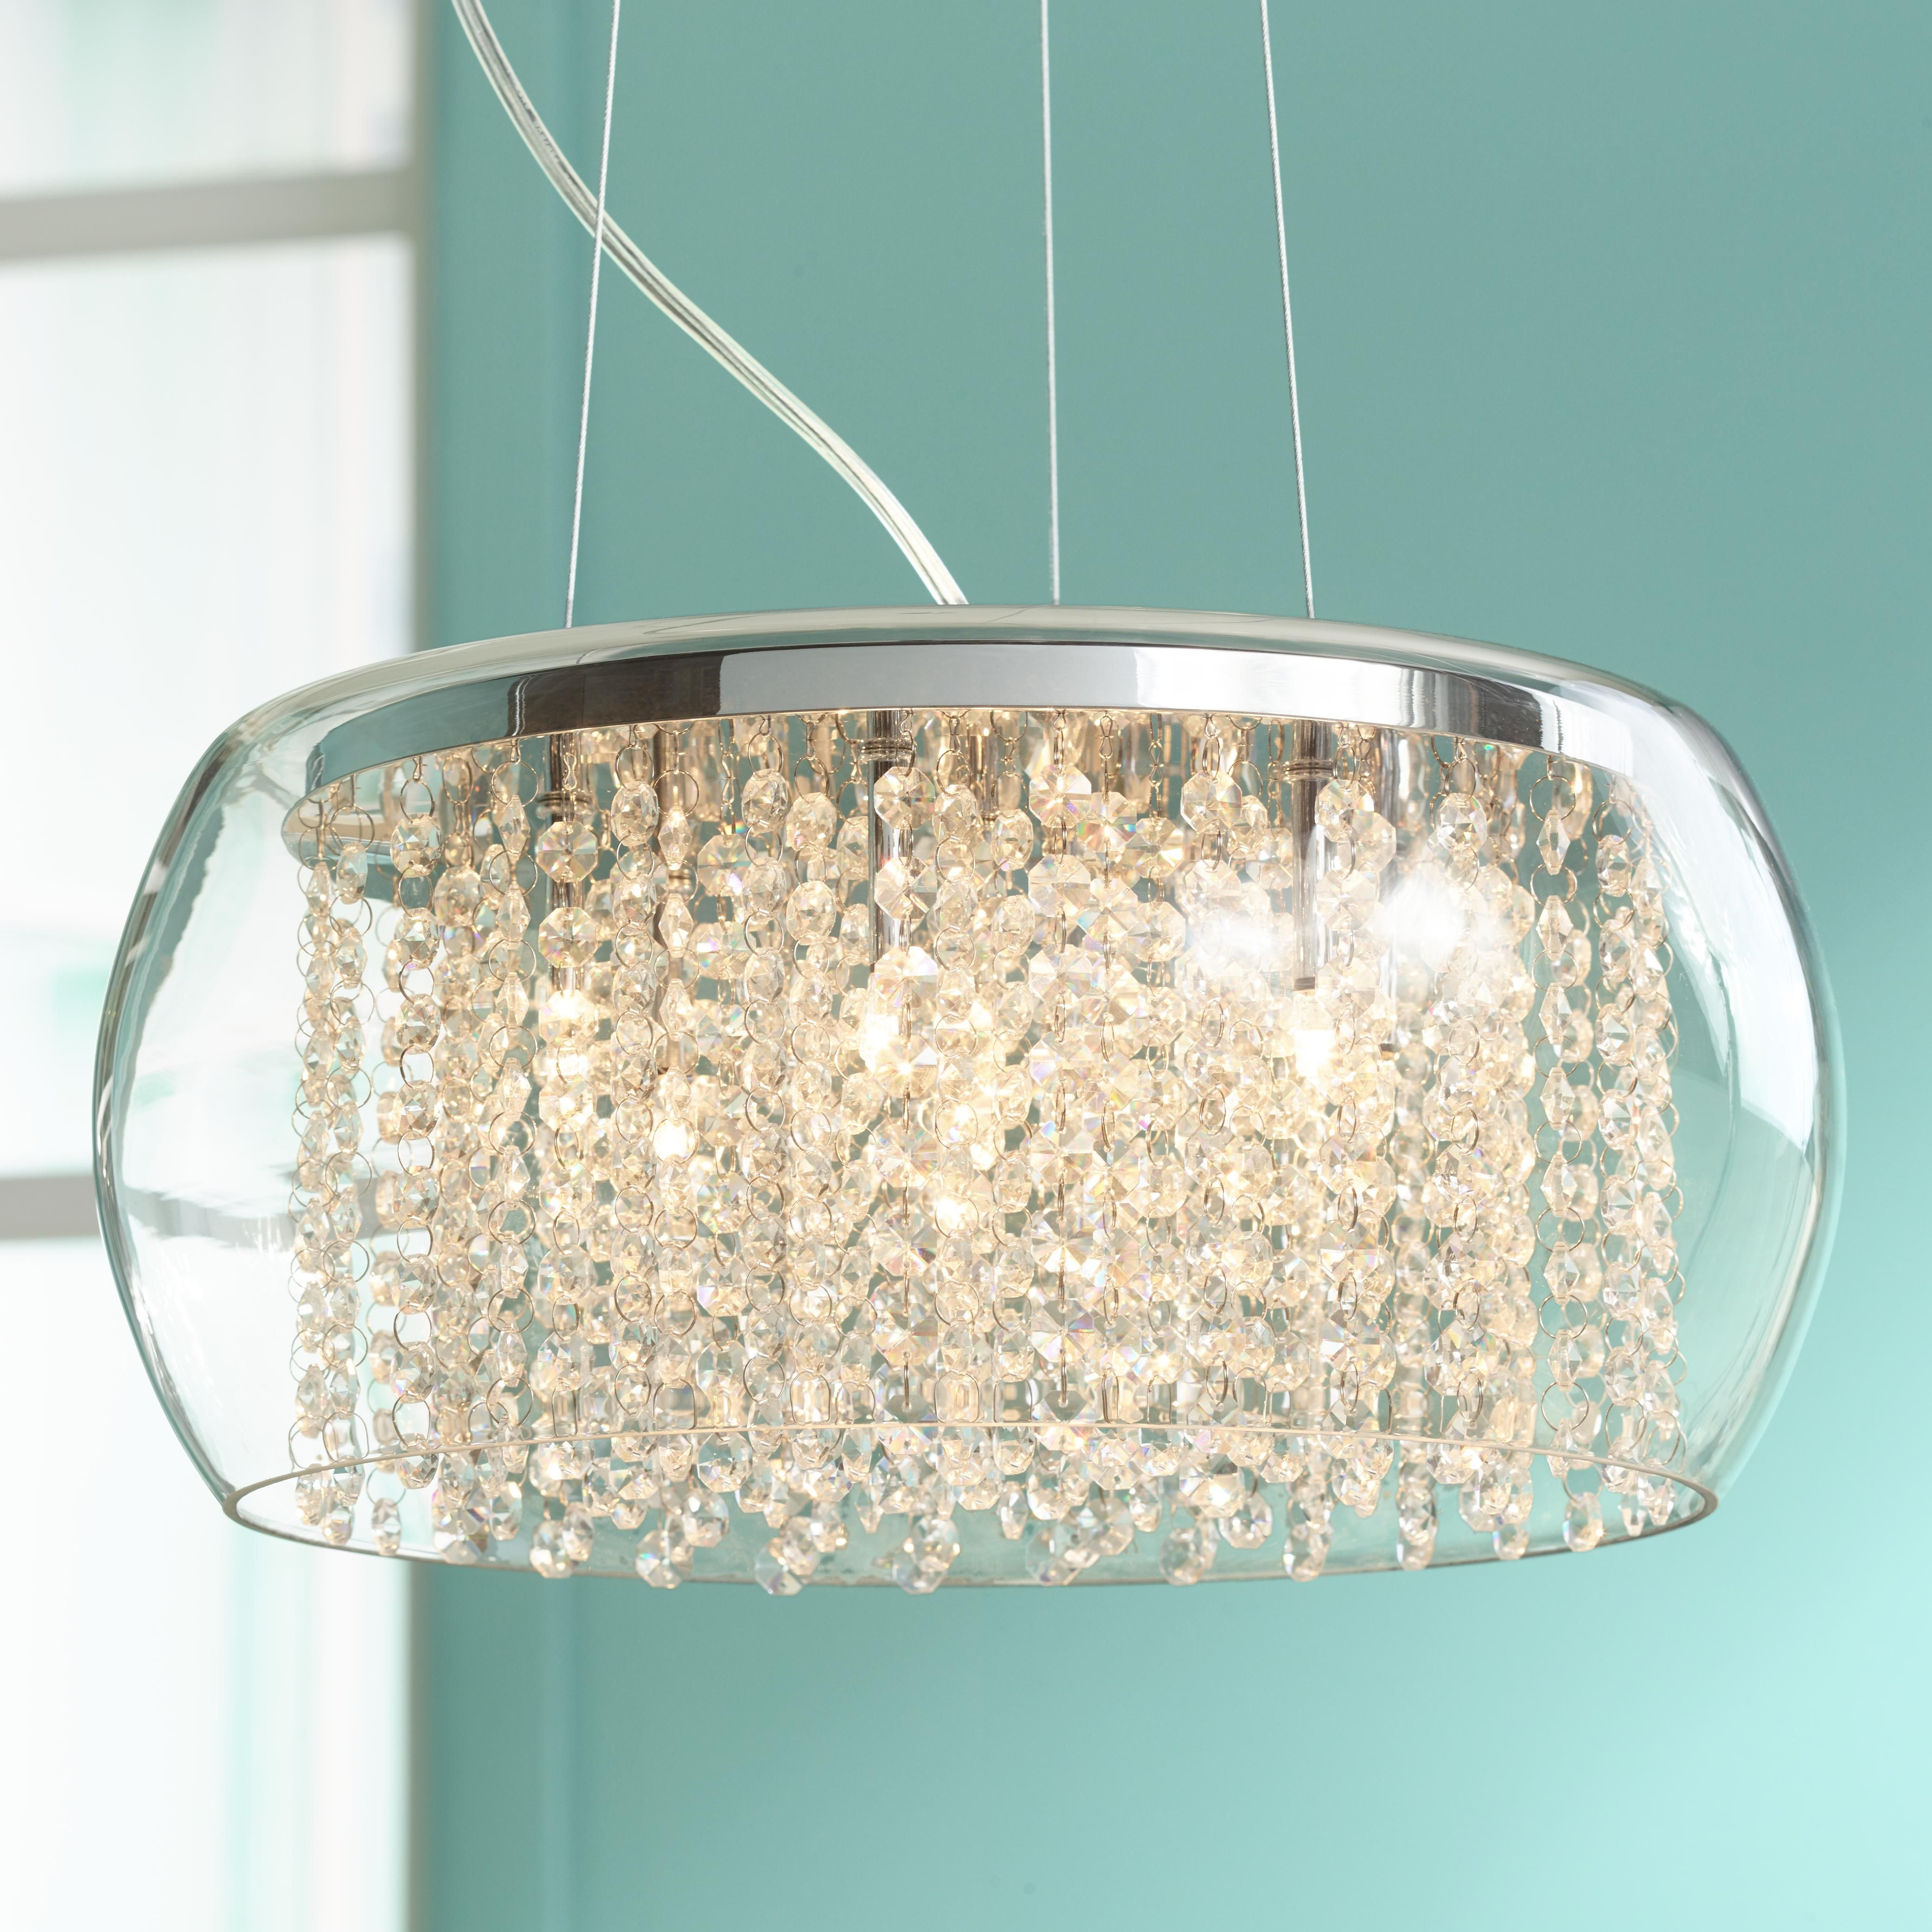 Possini euro crystal rainfall glass drum 17 wide chandelier possini euro crystal rainfall glass drum 17 wide chandelier arubaitofo Choice Image